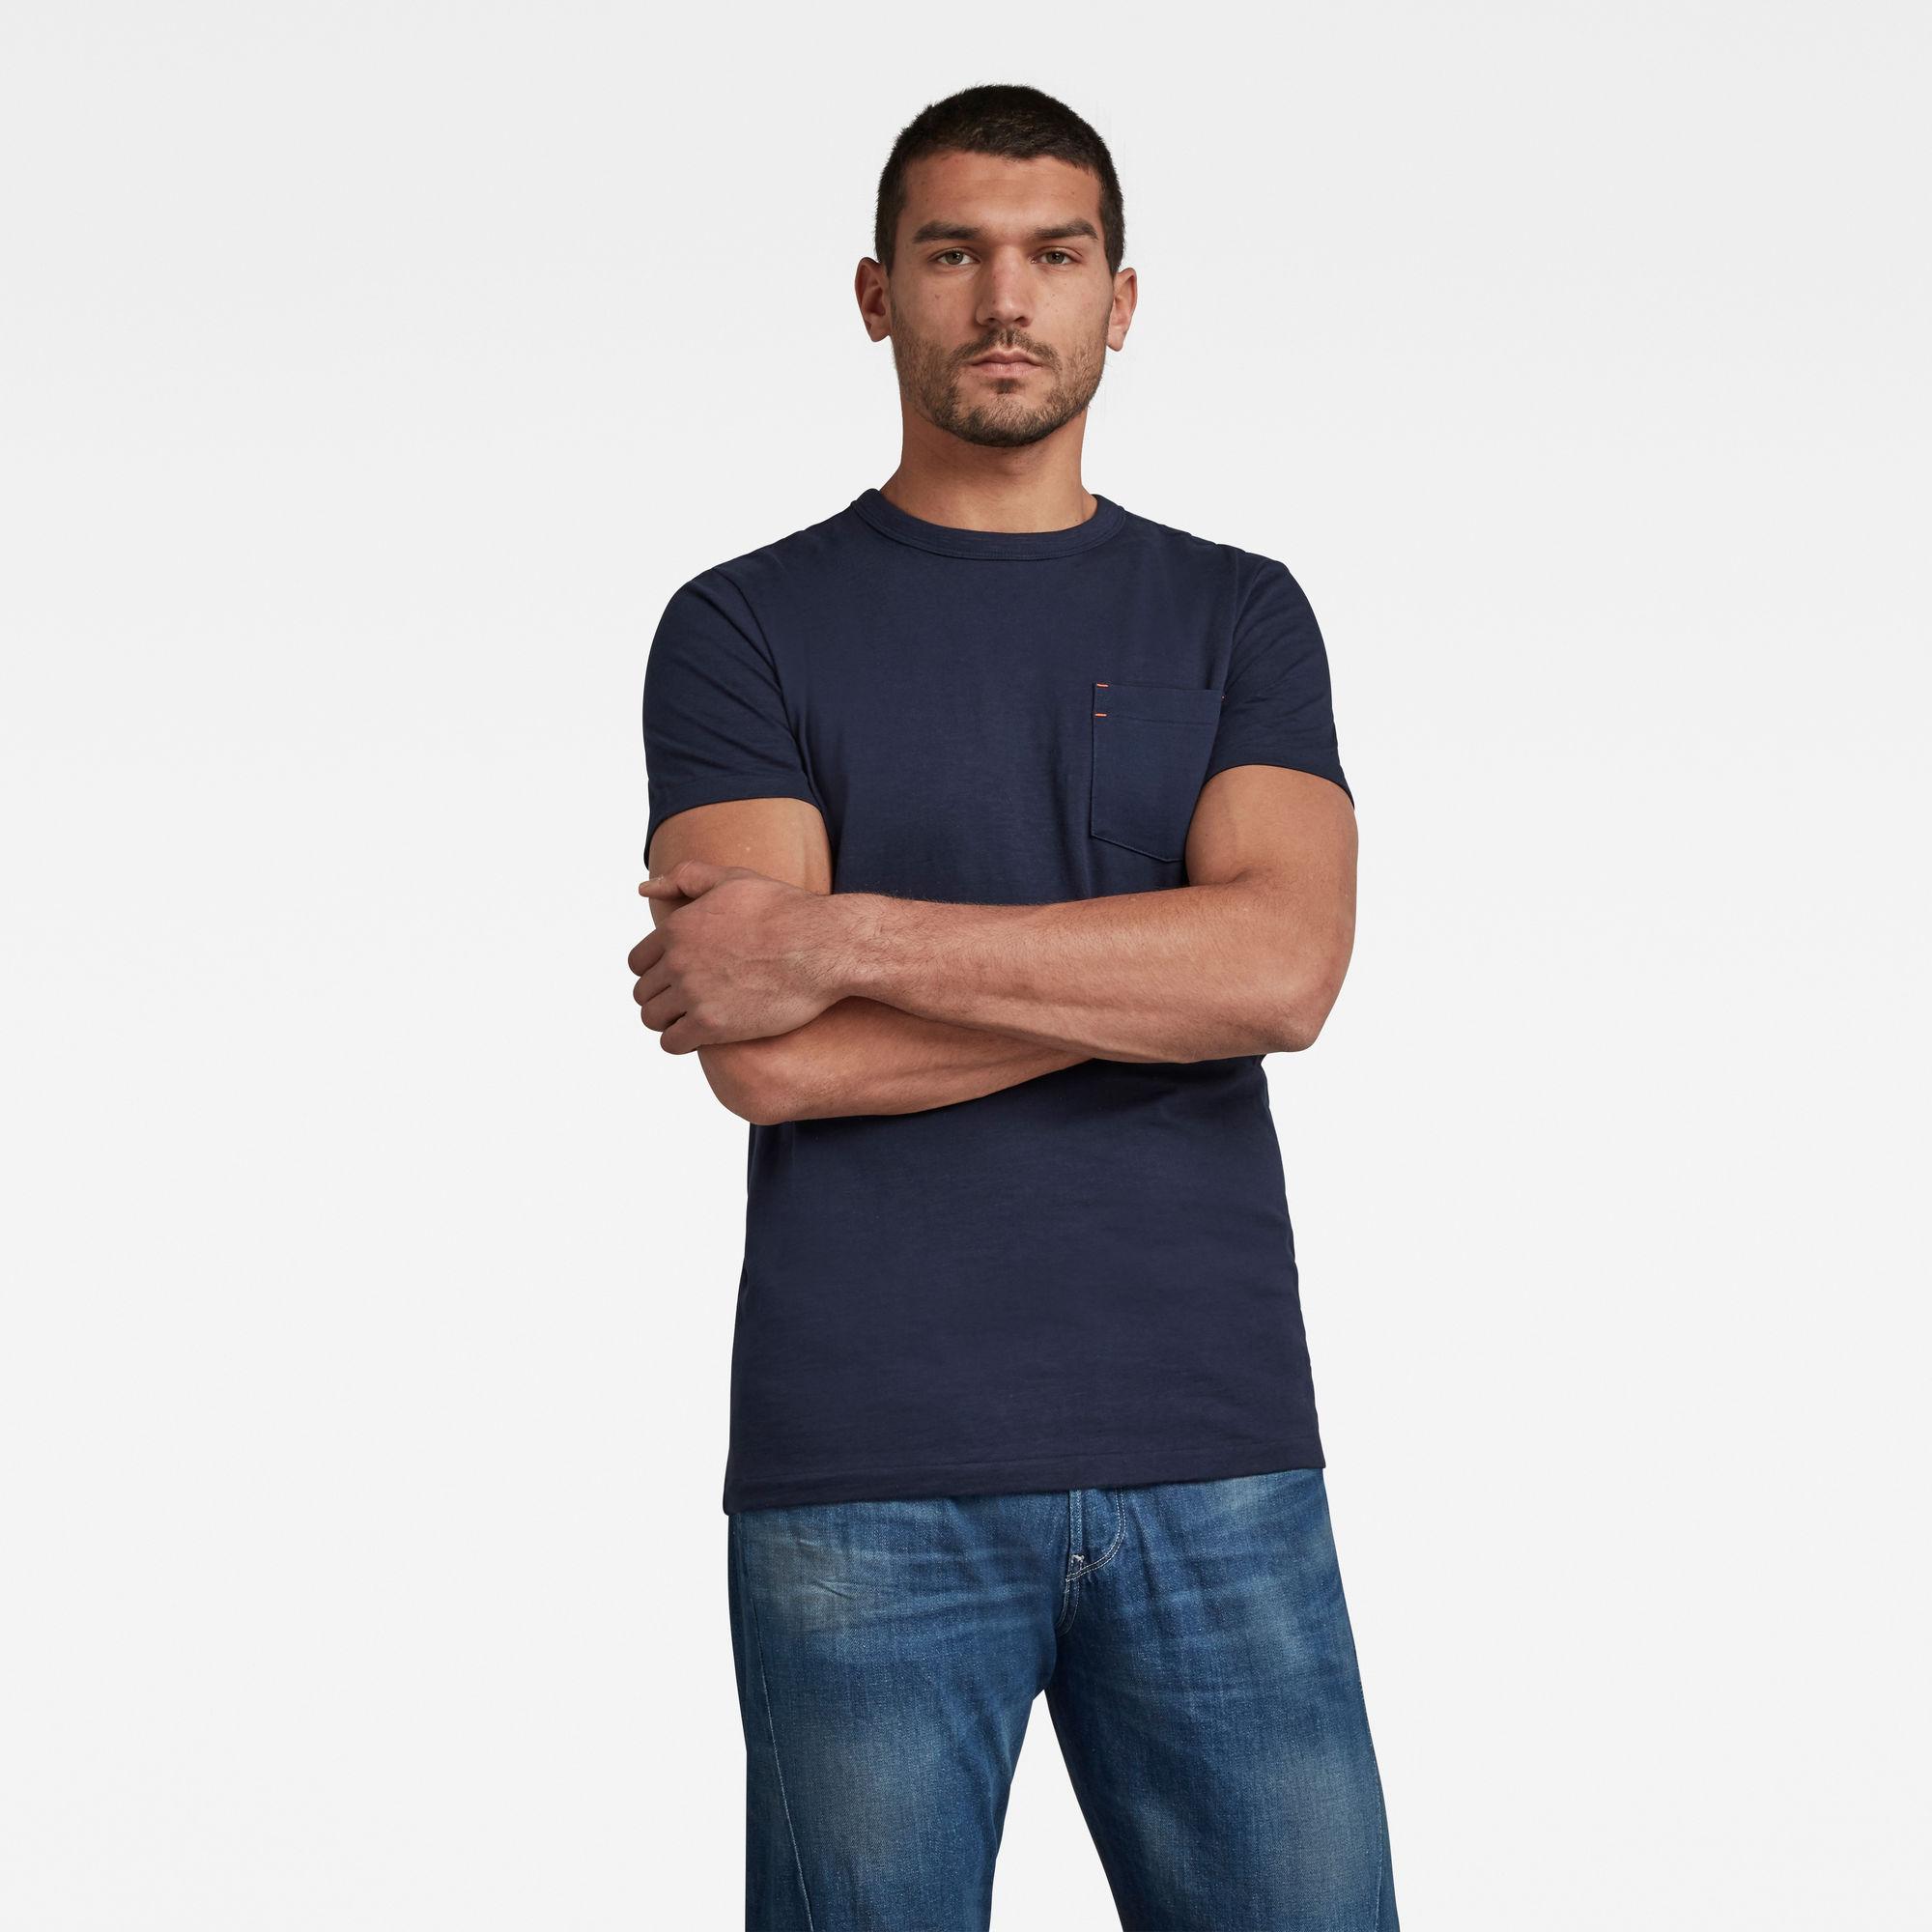 G-Star RAW Heren Contrast Mercerized Pocket T-Shirt Donkerblauw